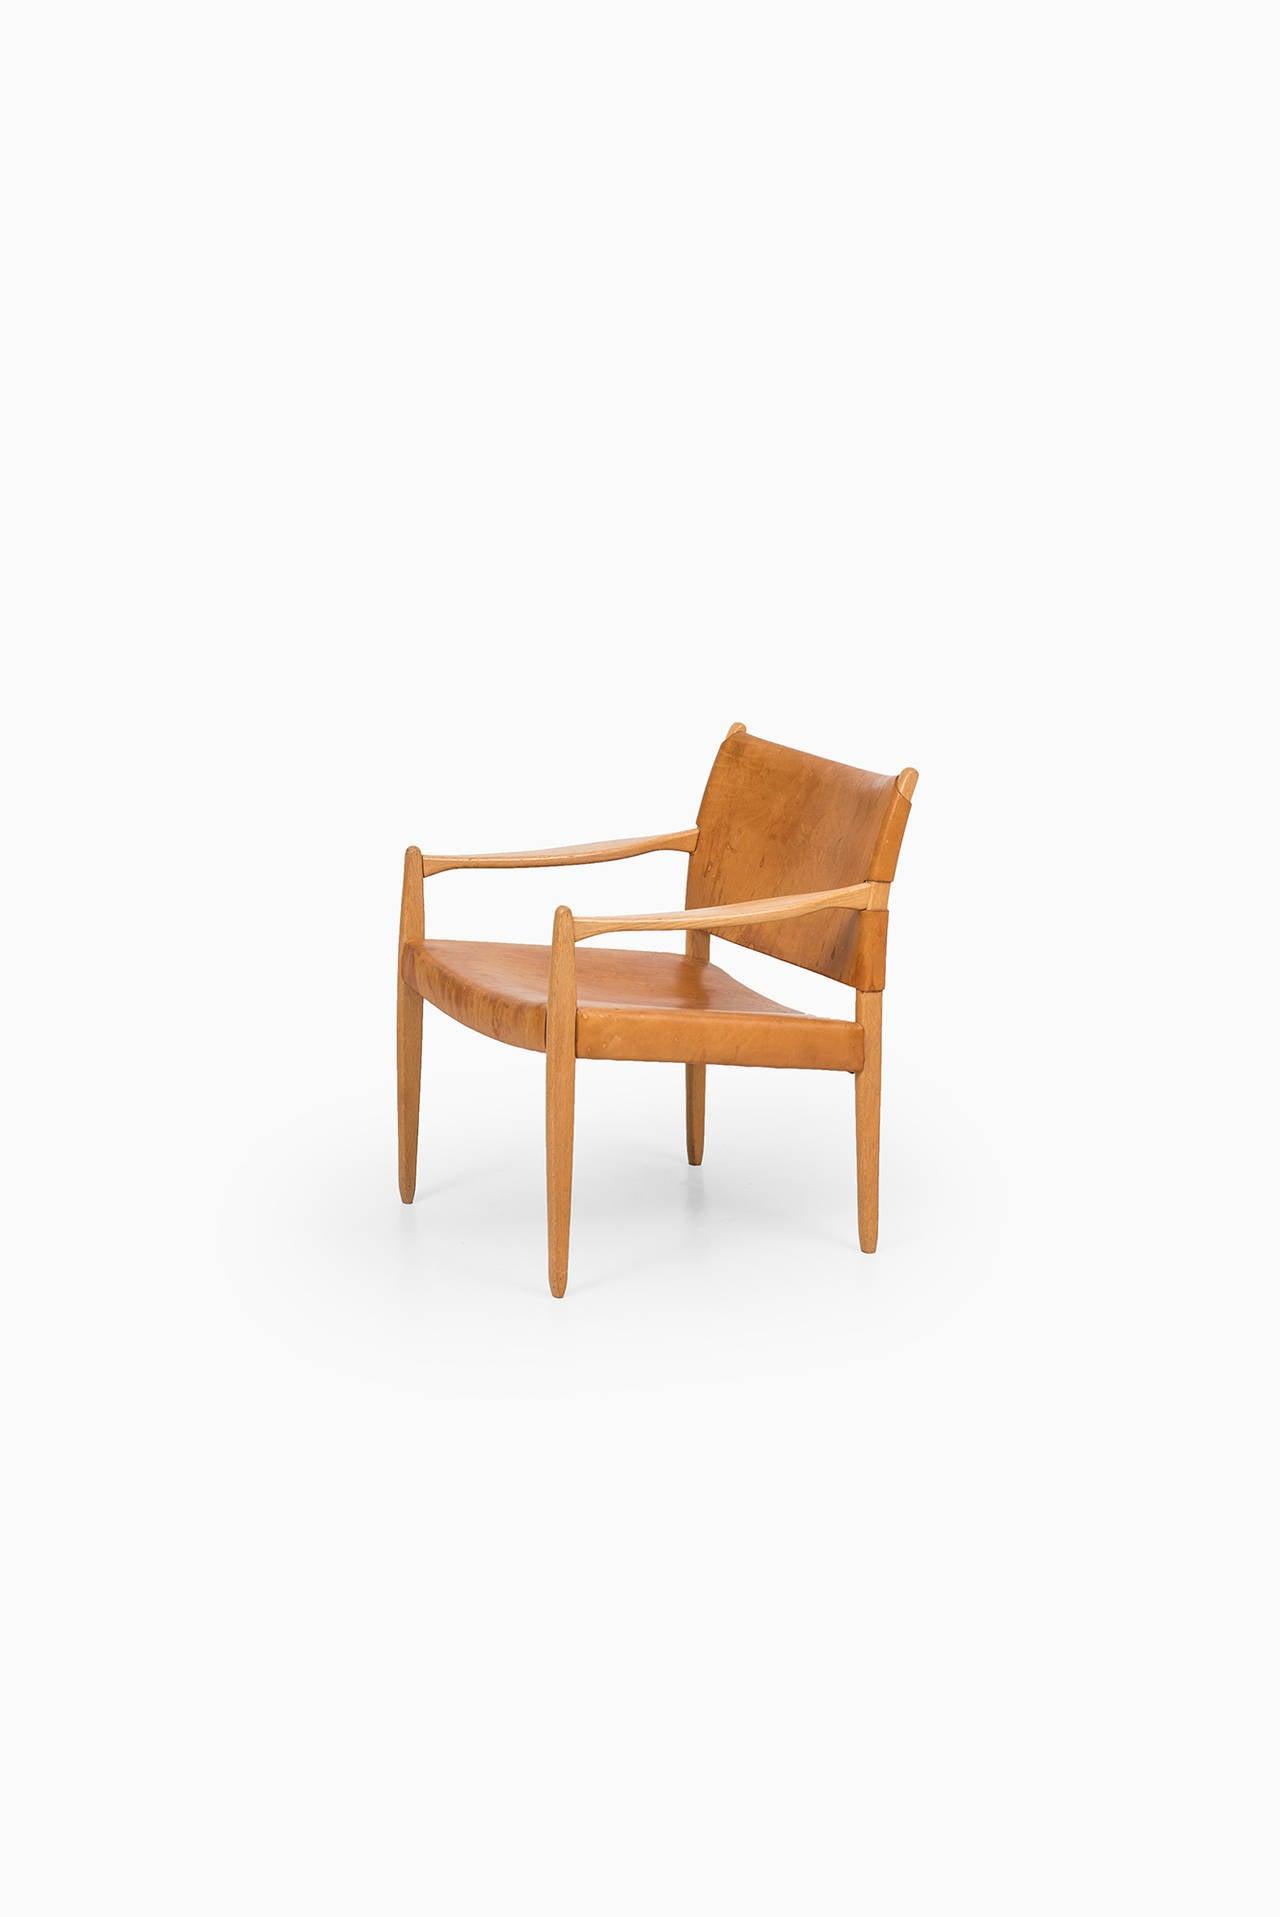 Swedish Per-Olof Scotte easy chairs model Premiär produced in Sweden